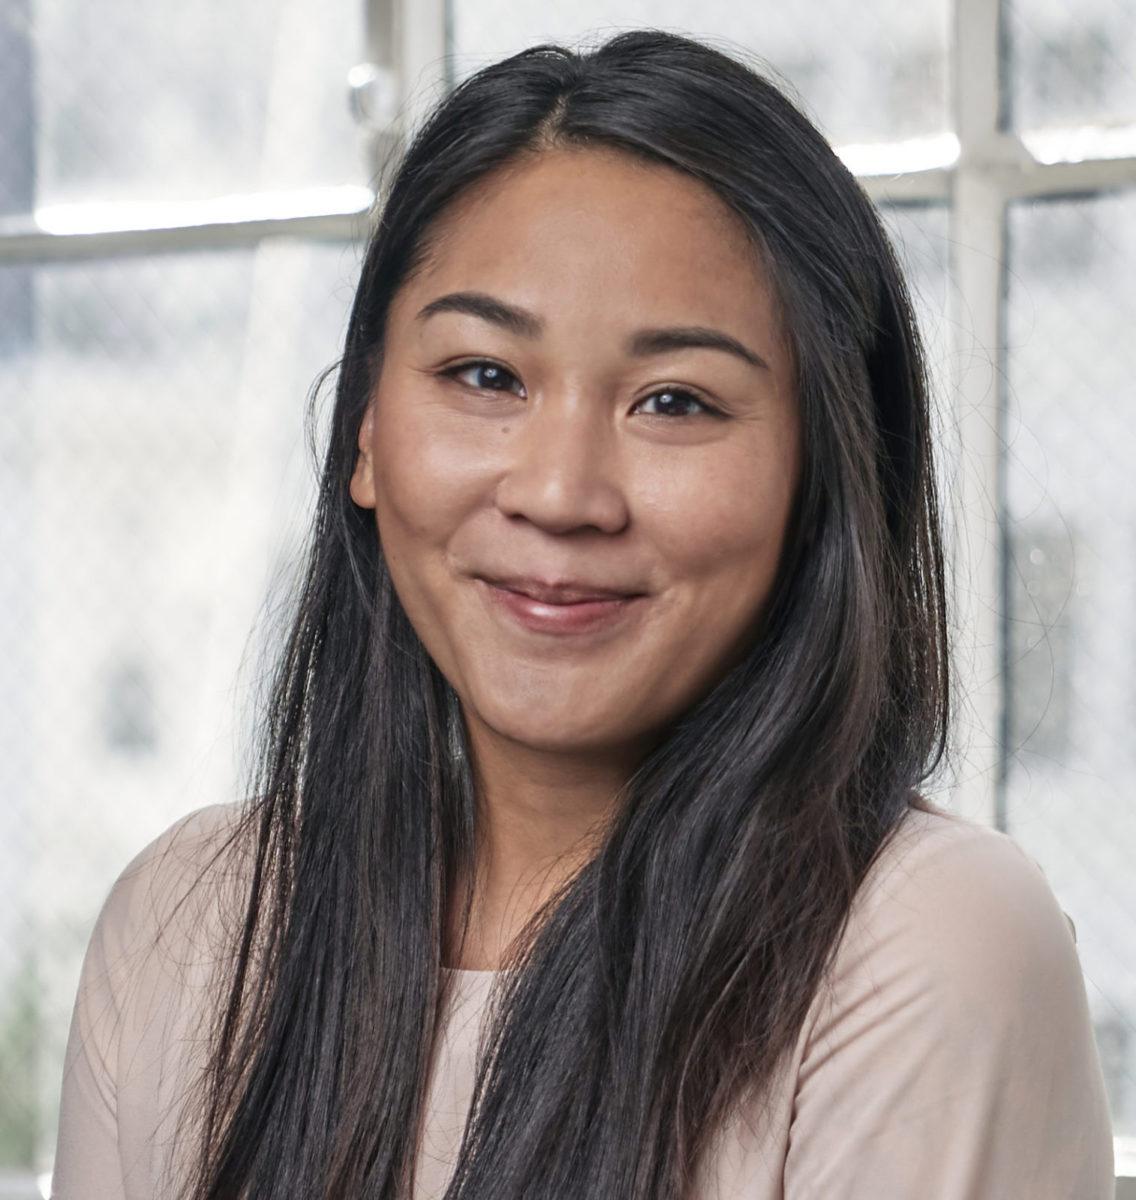 Carolyn Huynh's headshot